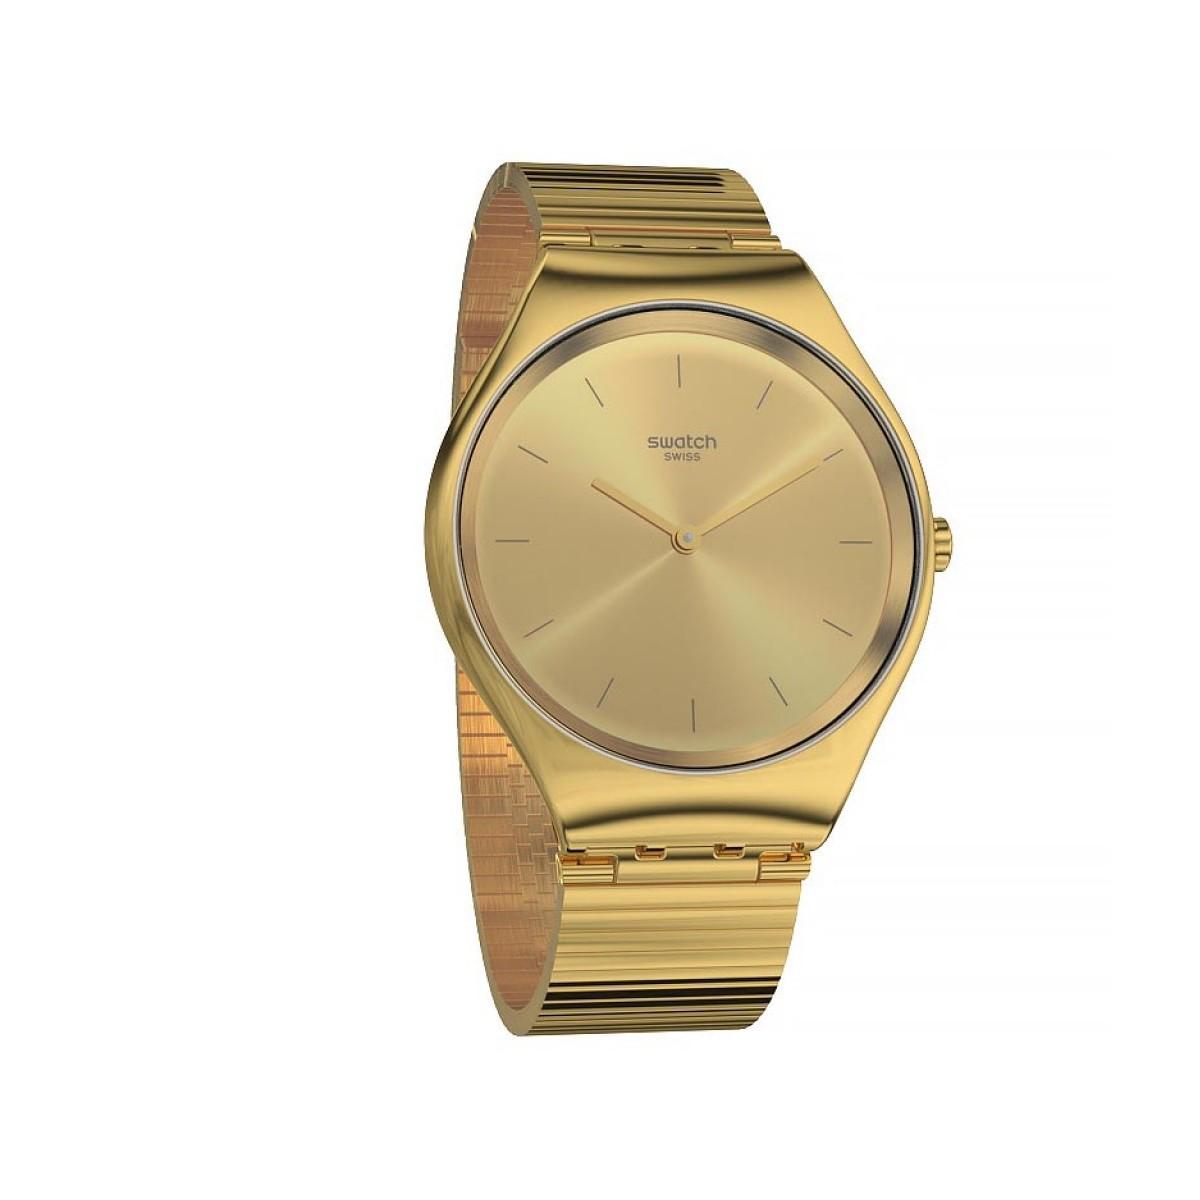 Skinlingot Joyería Swatch Reloj Gaber xtsCBhrQd